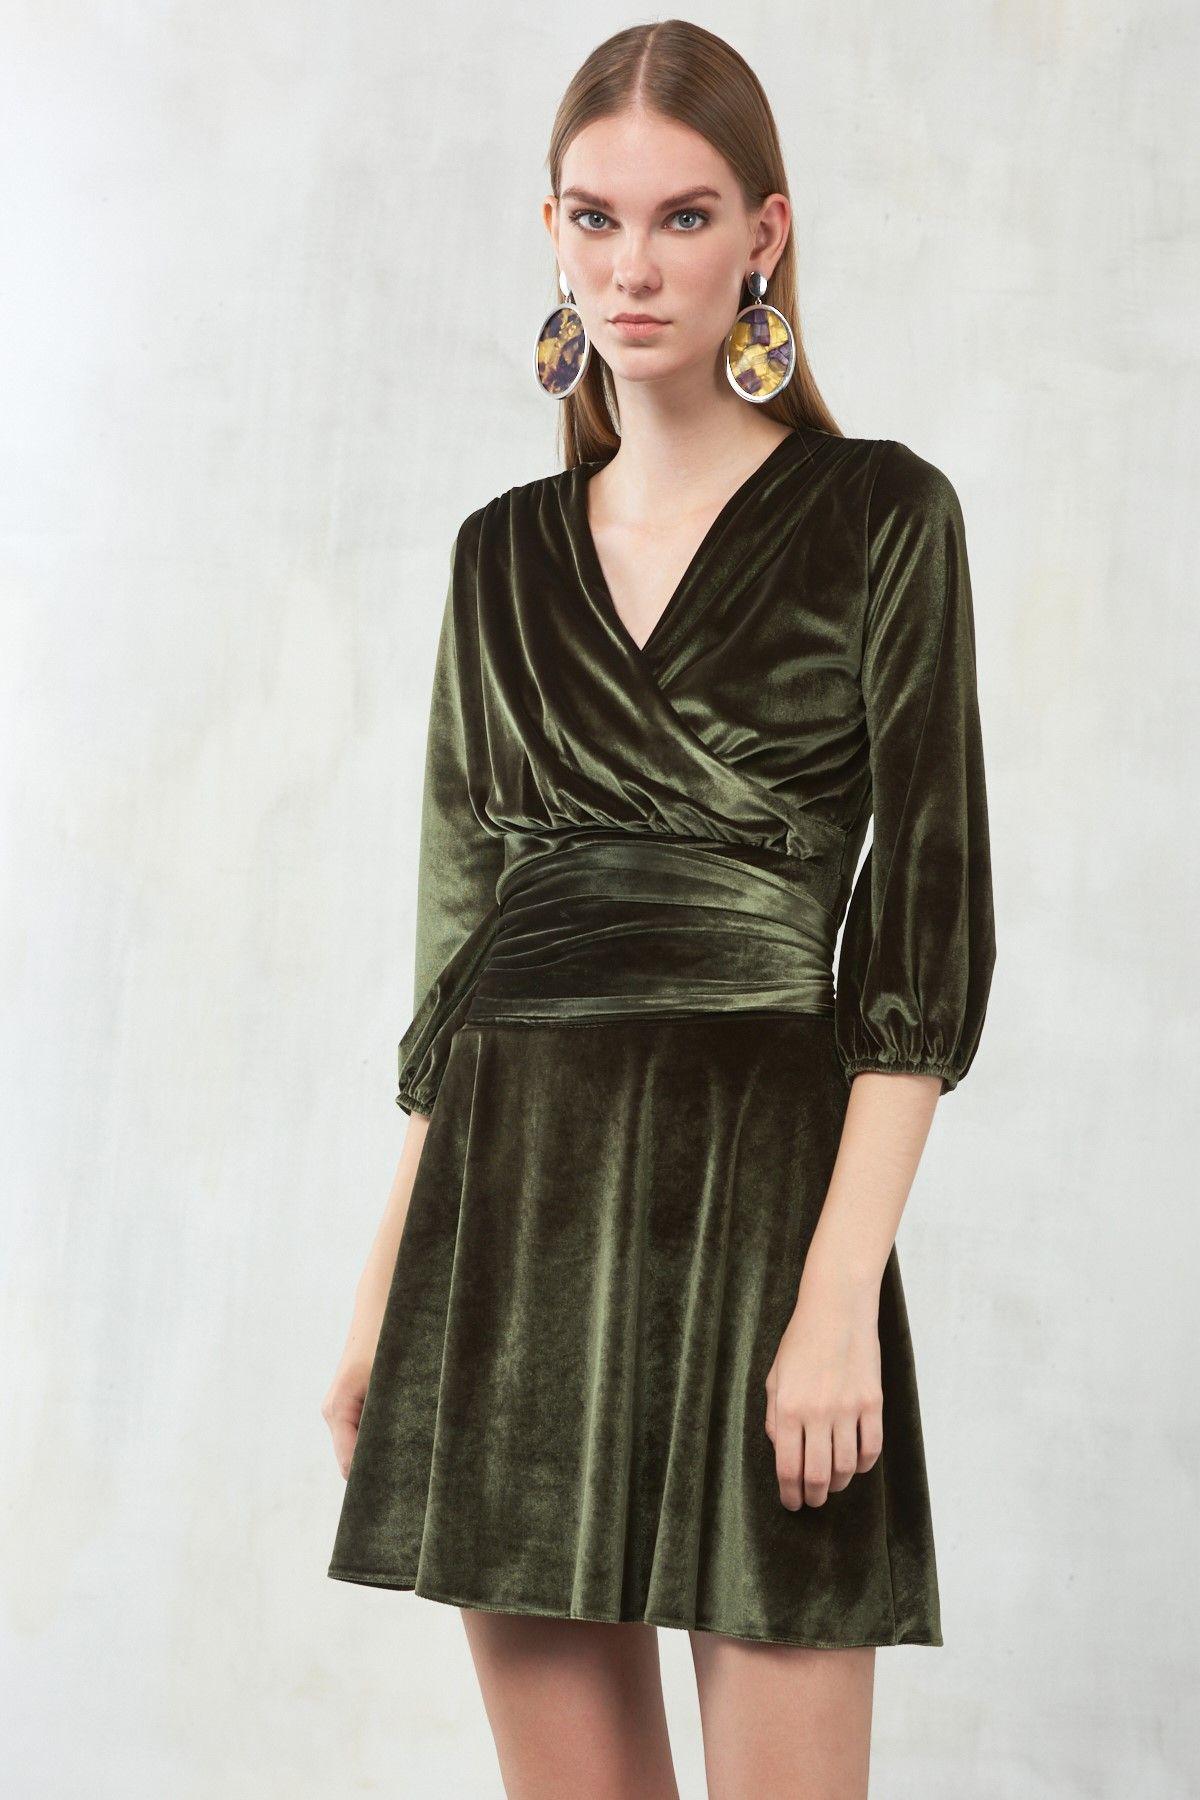 Milla By Trendyol Trendyolmilla Haki Kadife Kruvaze Yaka Belden Baglama Detayli Elbise Elbise The Dress Mutevazi Moda